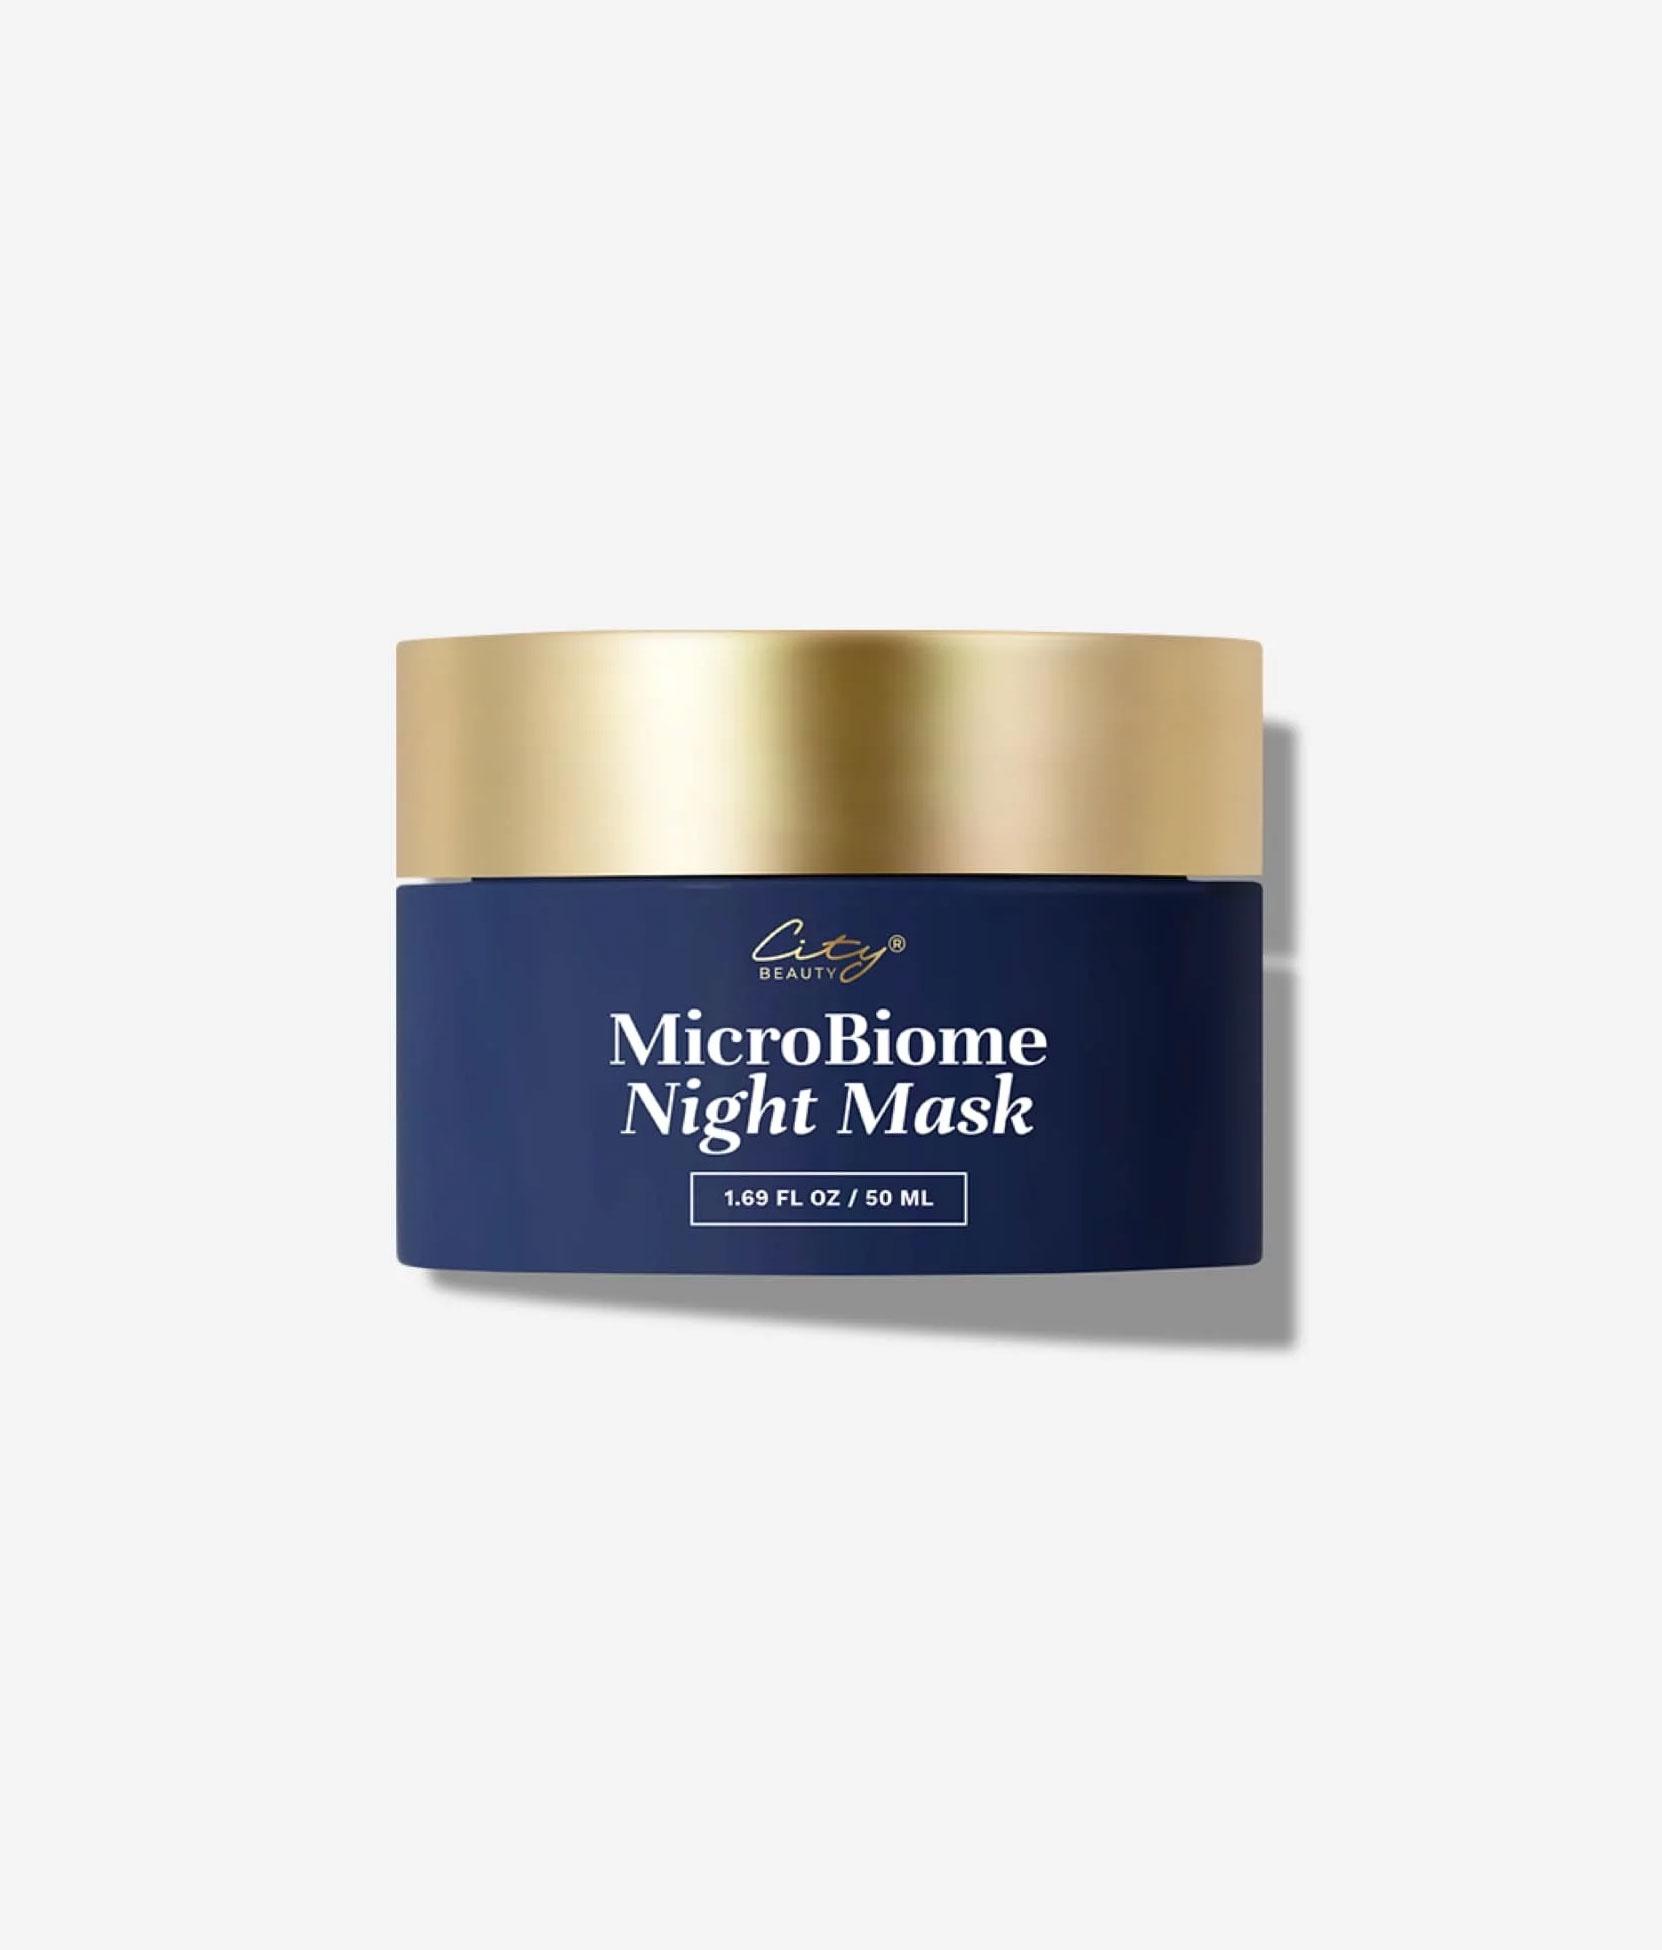 City Beauty Microbiome Night Mask